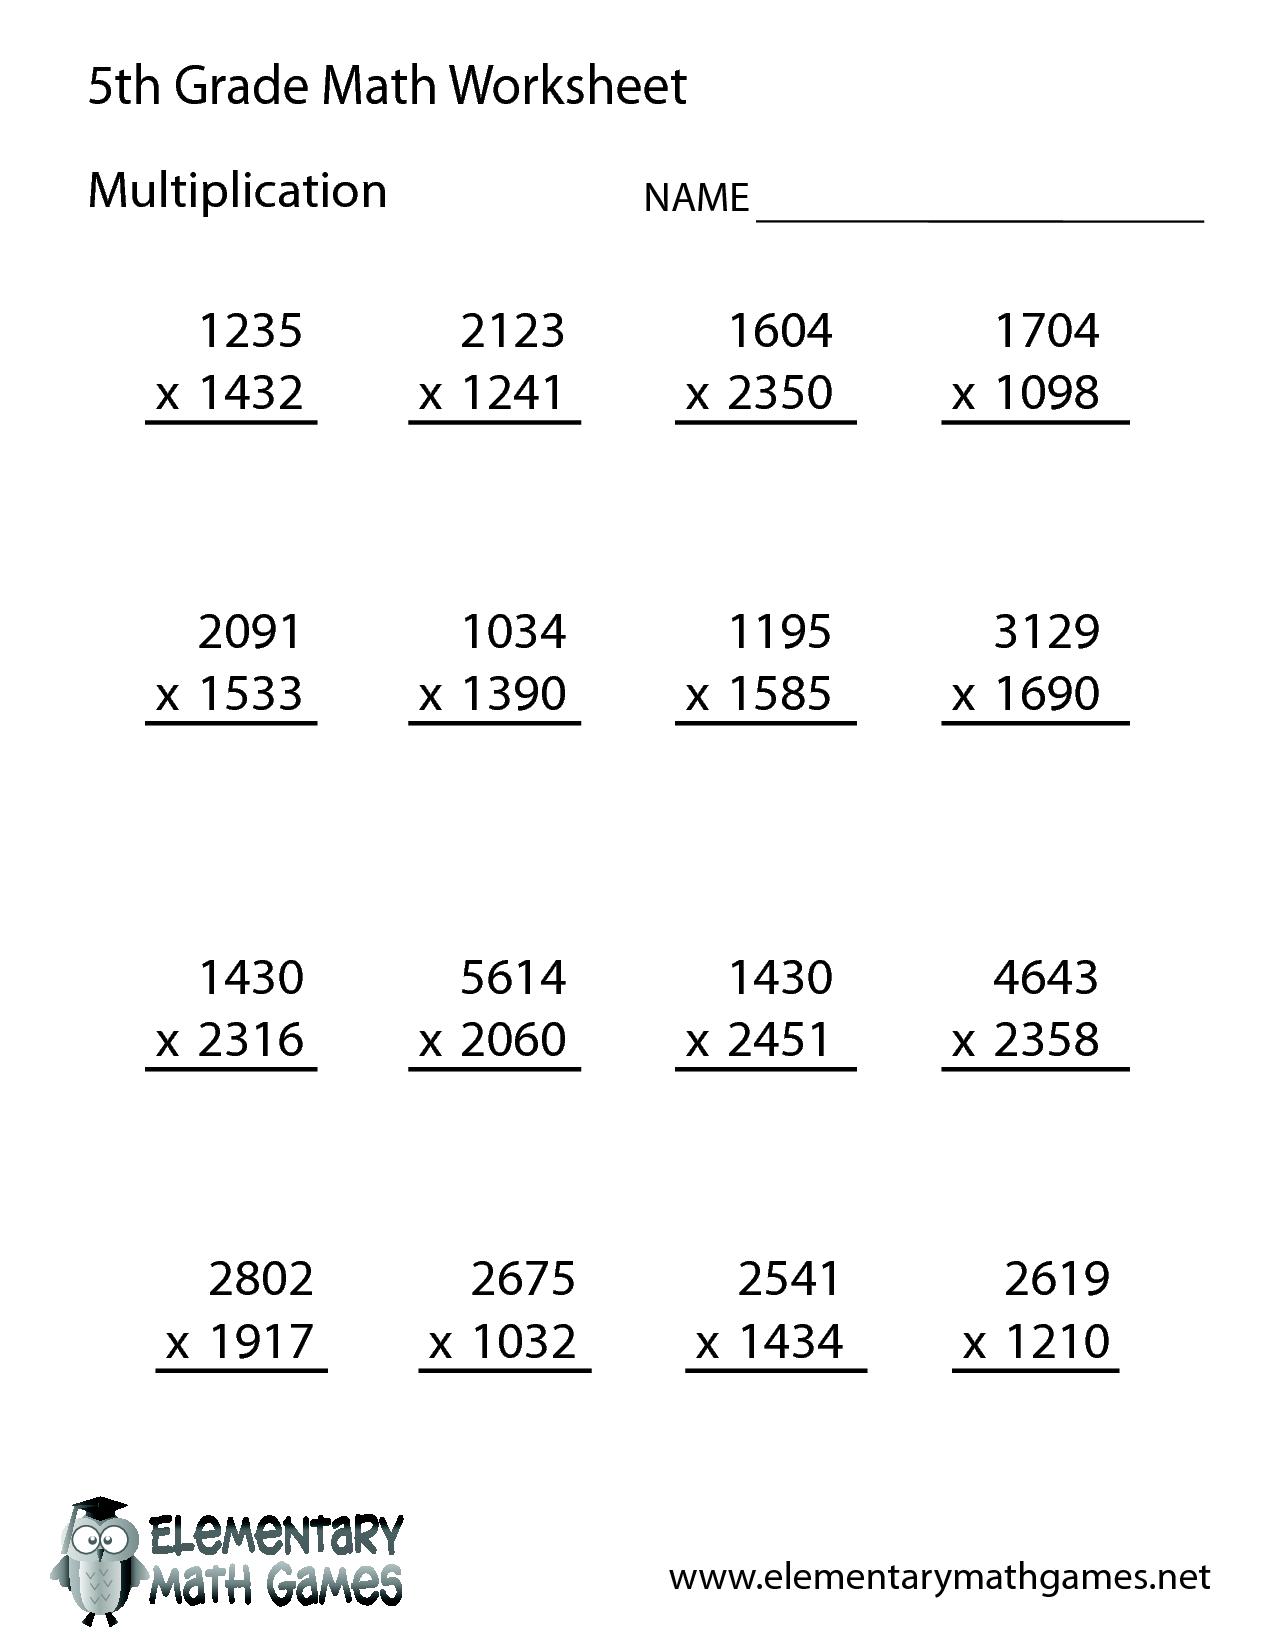 Free math worksheets for th grade worksheet also rh pinterest